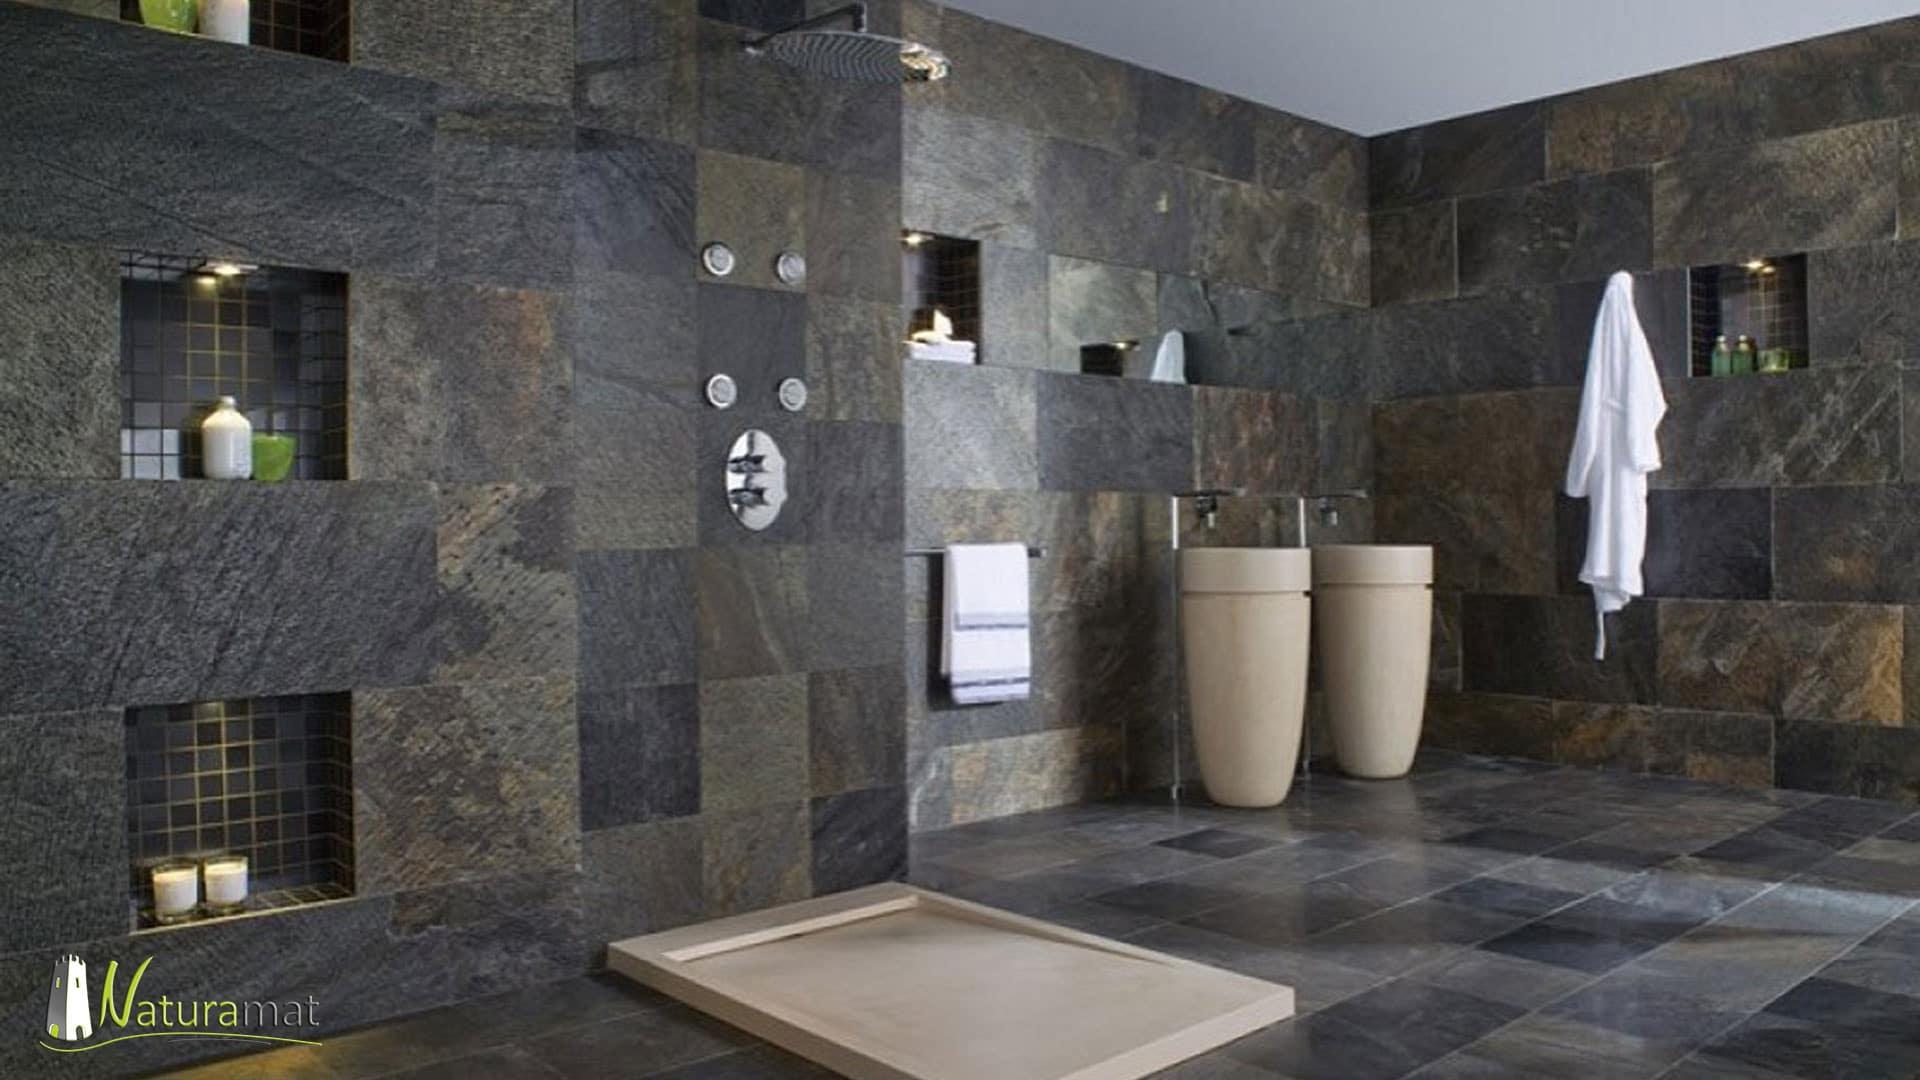 Pierre Naturelle Salle De Bain design de salle de bain, spa, hammam en feuille de pierre